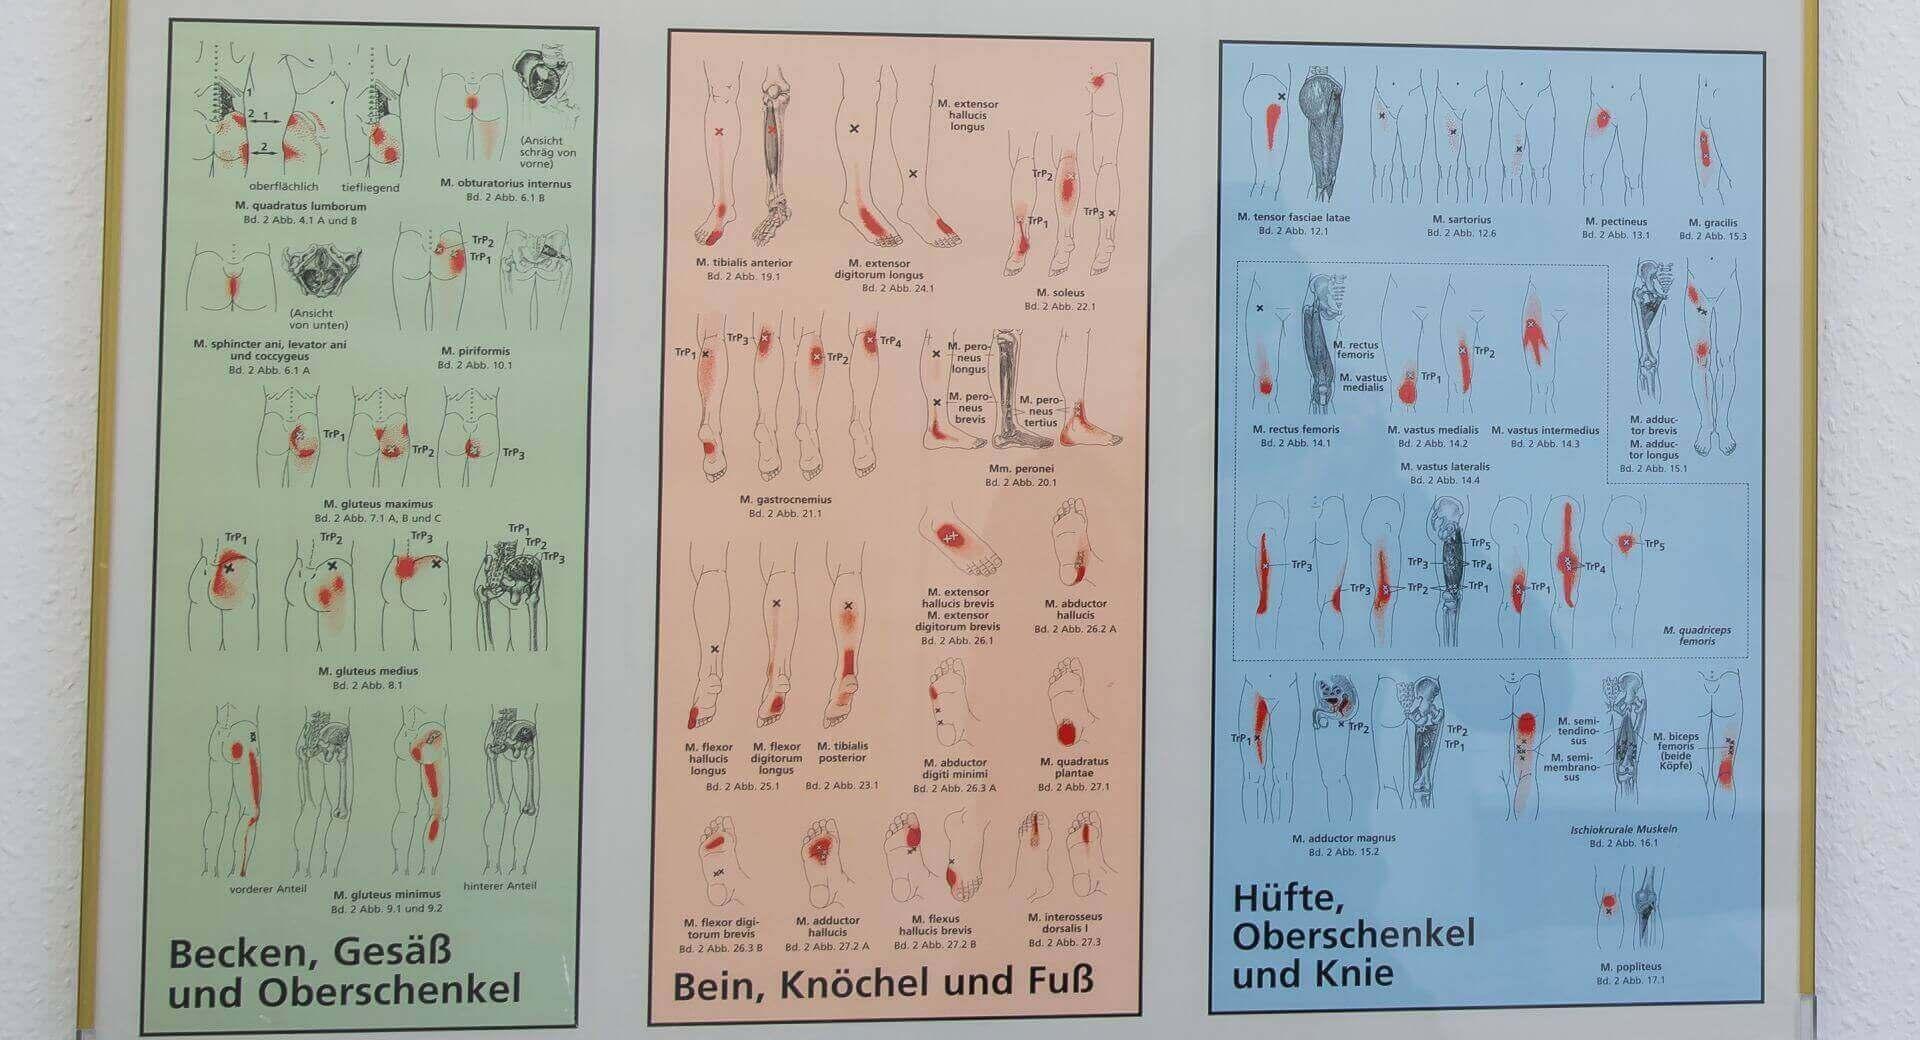 Zahlreiche Verletzungen behandlet in Bonn Orthopäde Wingenfeld